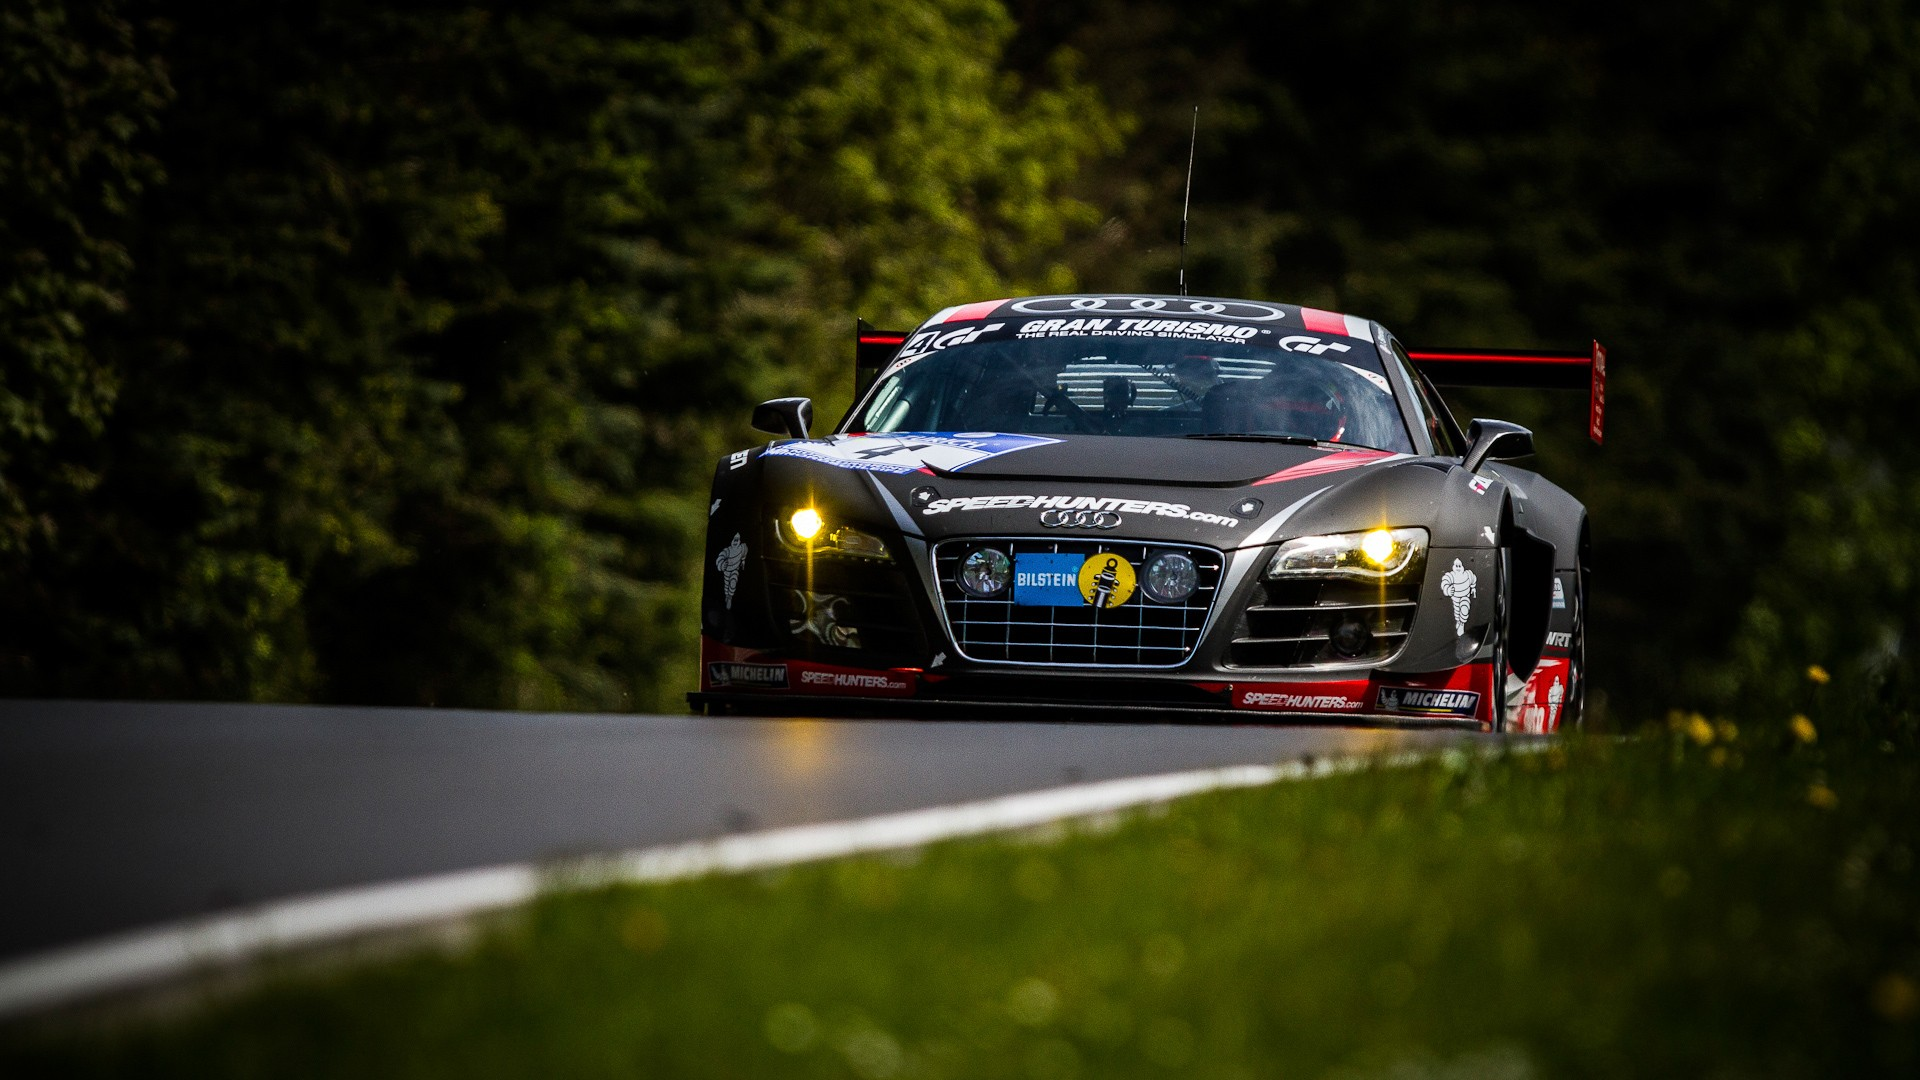 Audi in Gran Turismo Wallpaper | HD Car Wallpapers | ID #2749